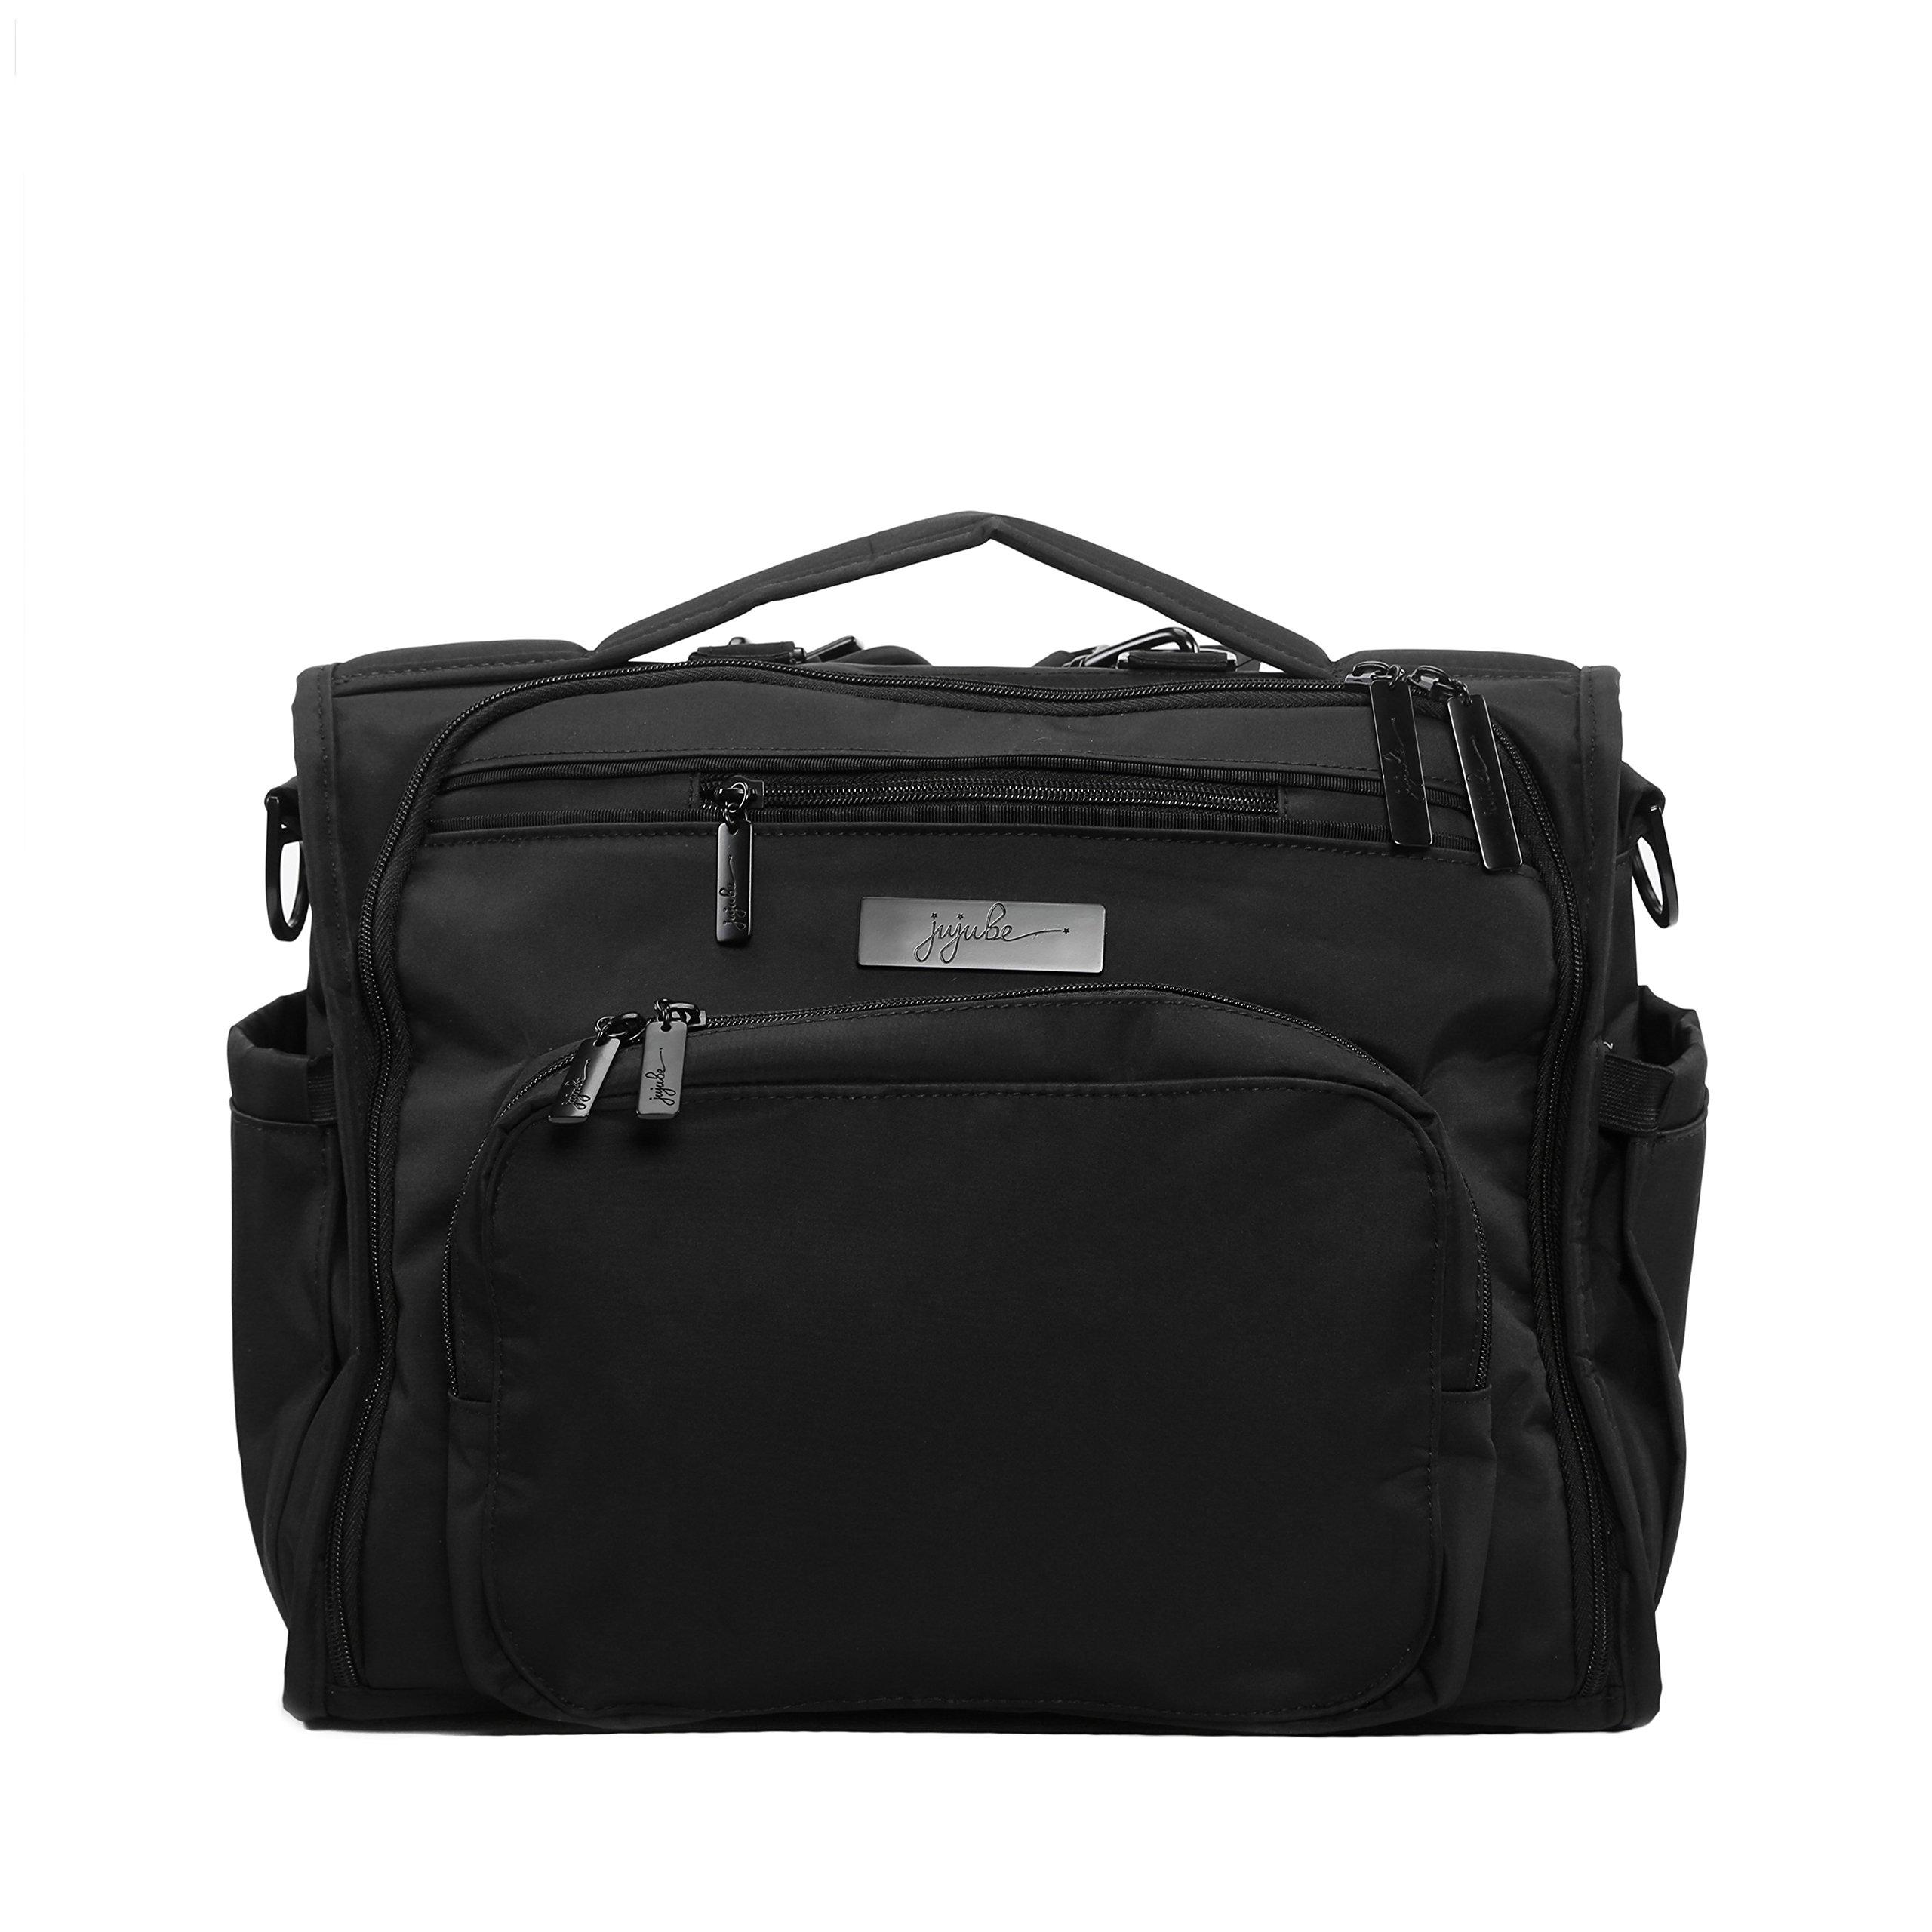 Ju-Ju-Be Onyx Collection B.F.F. Convertible Diaper Bag, Black Out